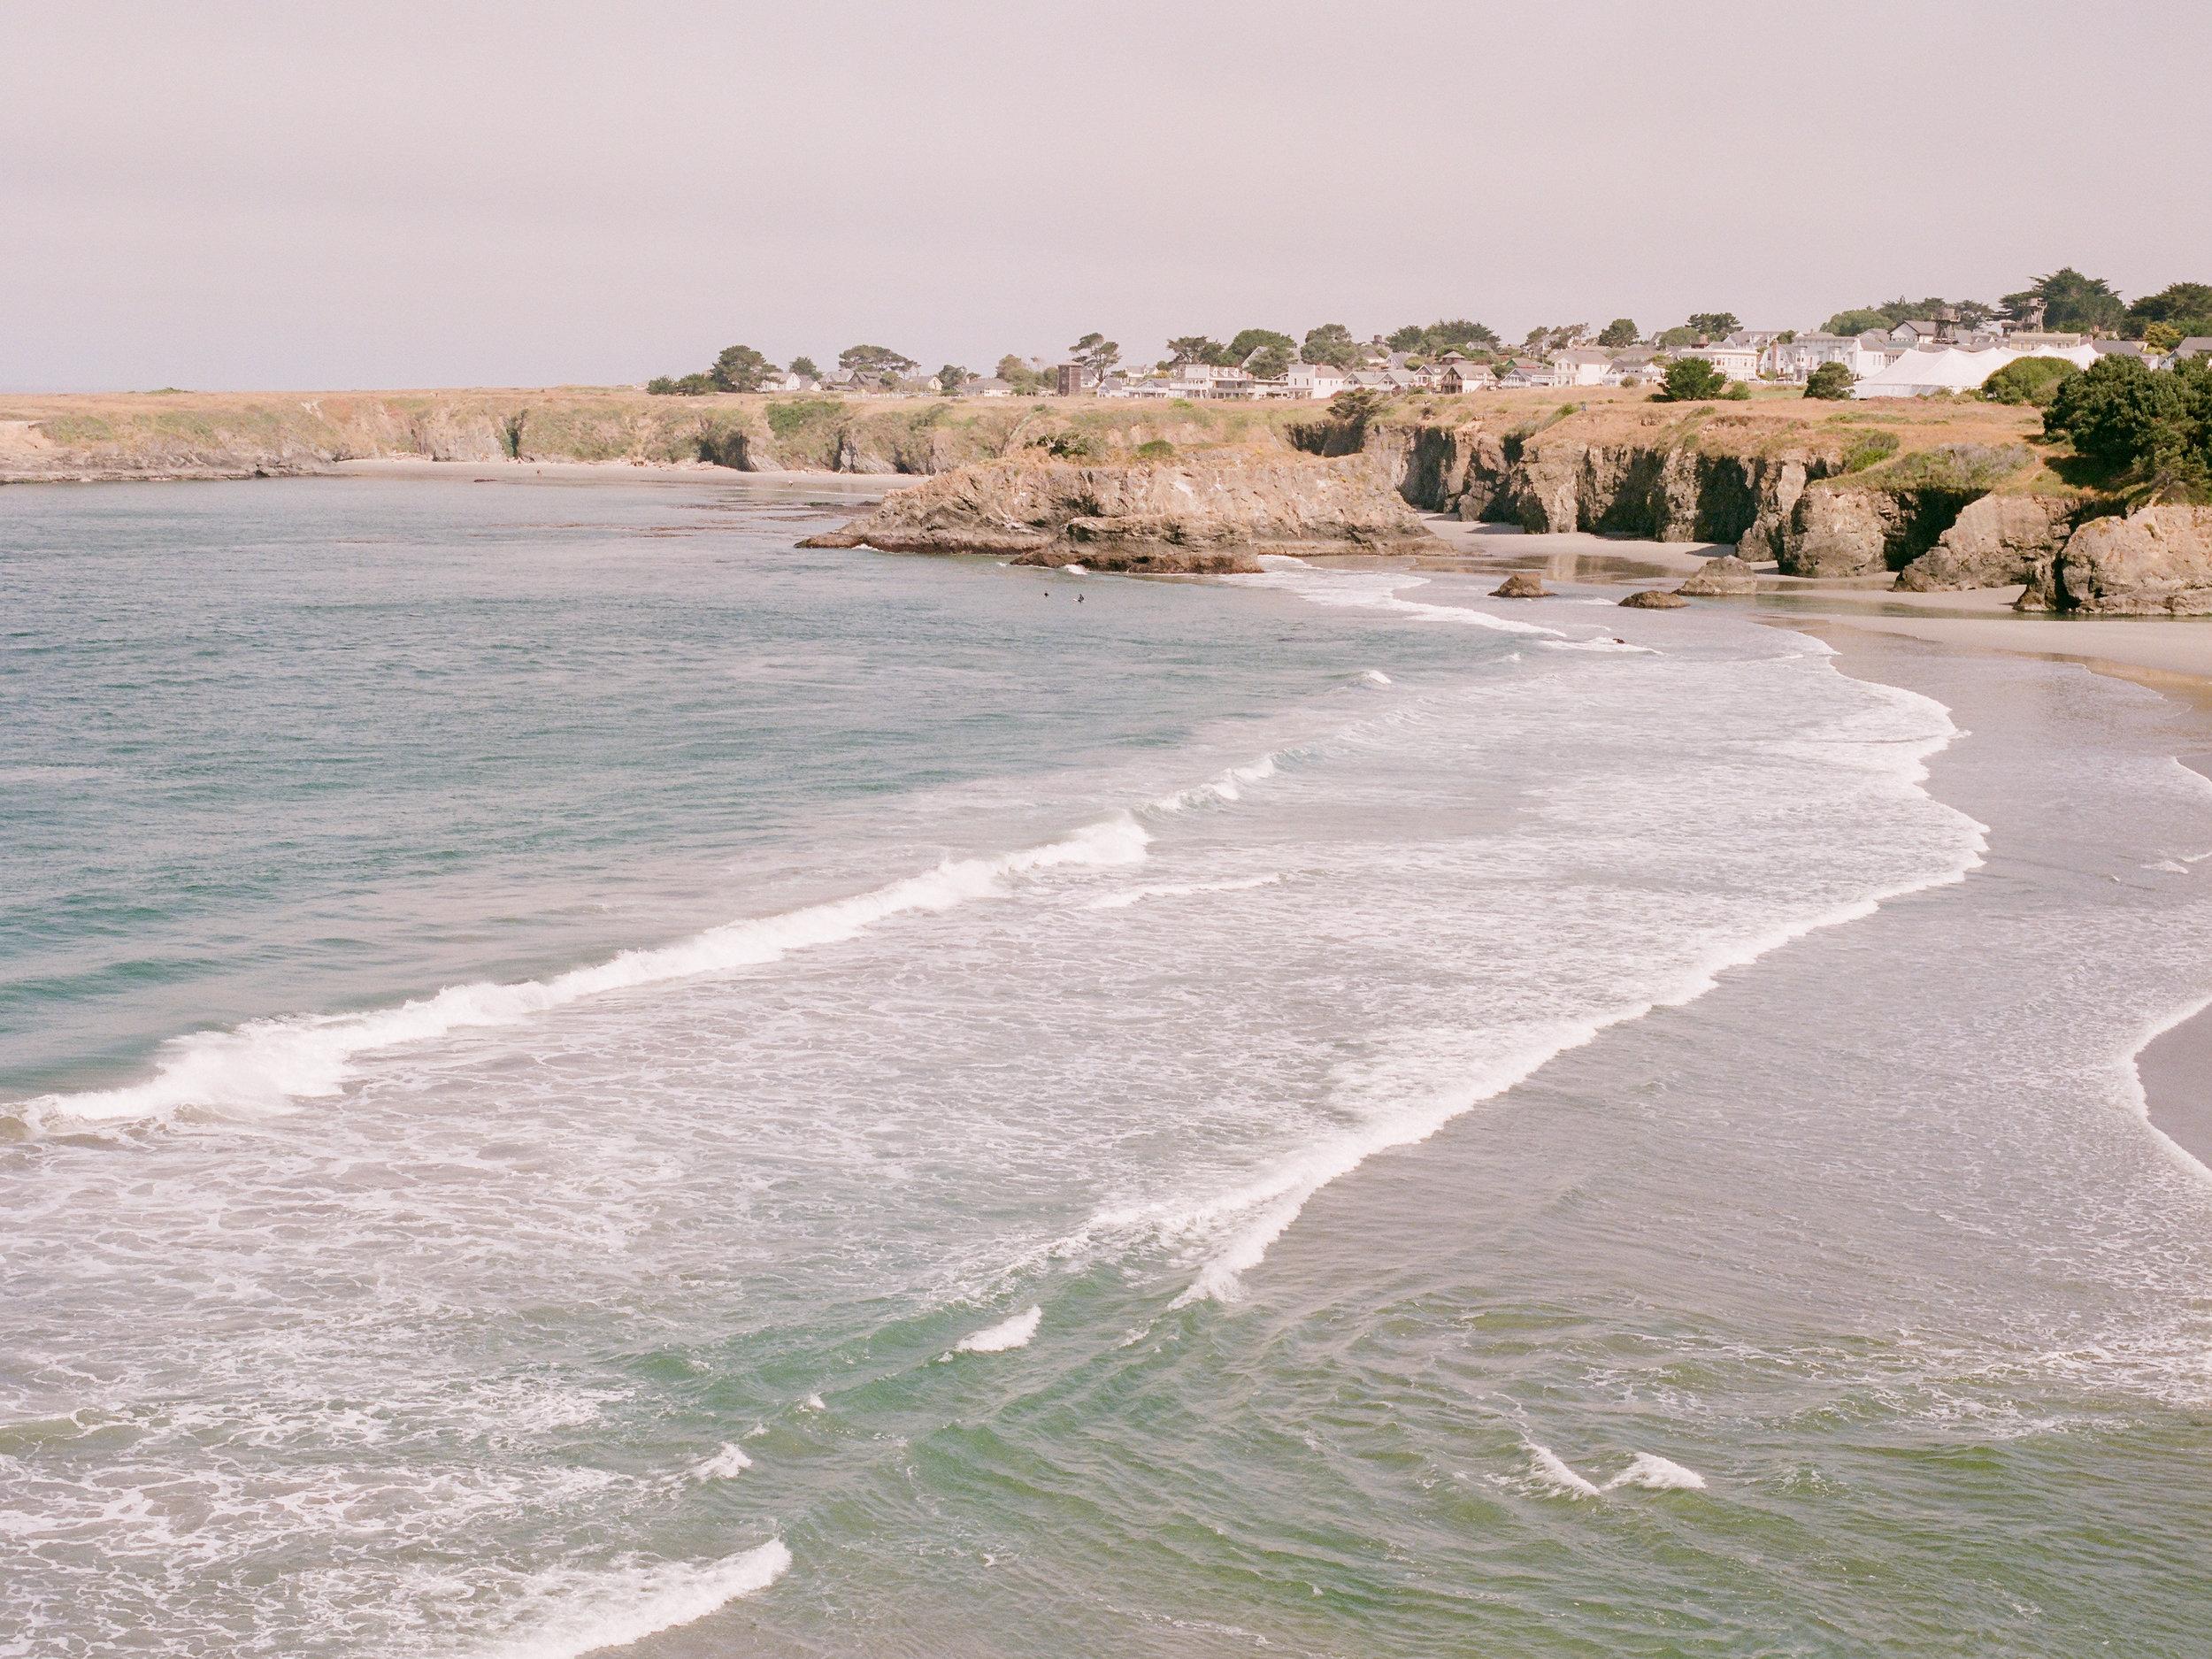 Mendocino-coast-lifestyle-portrait-photographerjpg